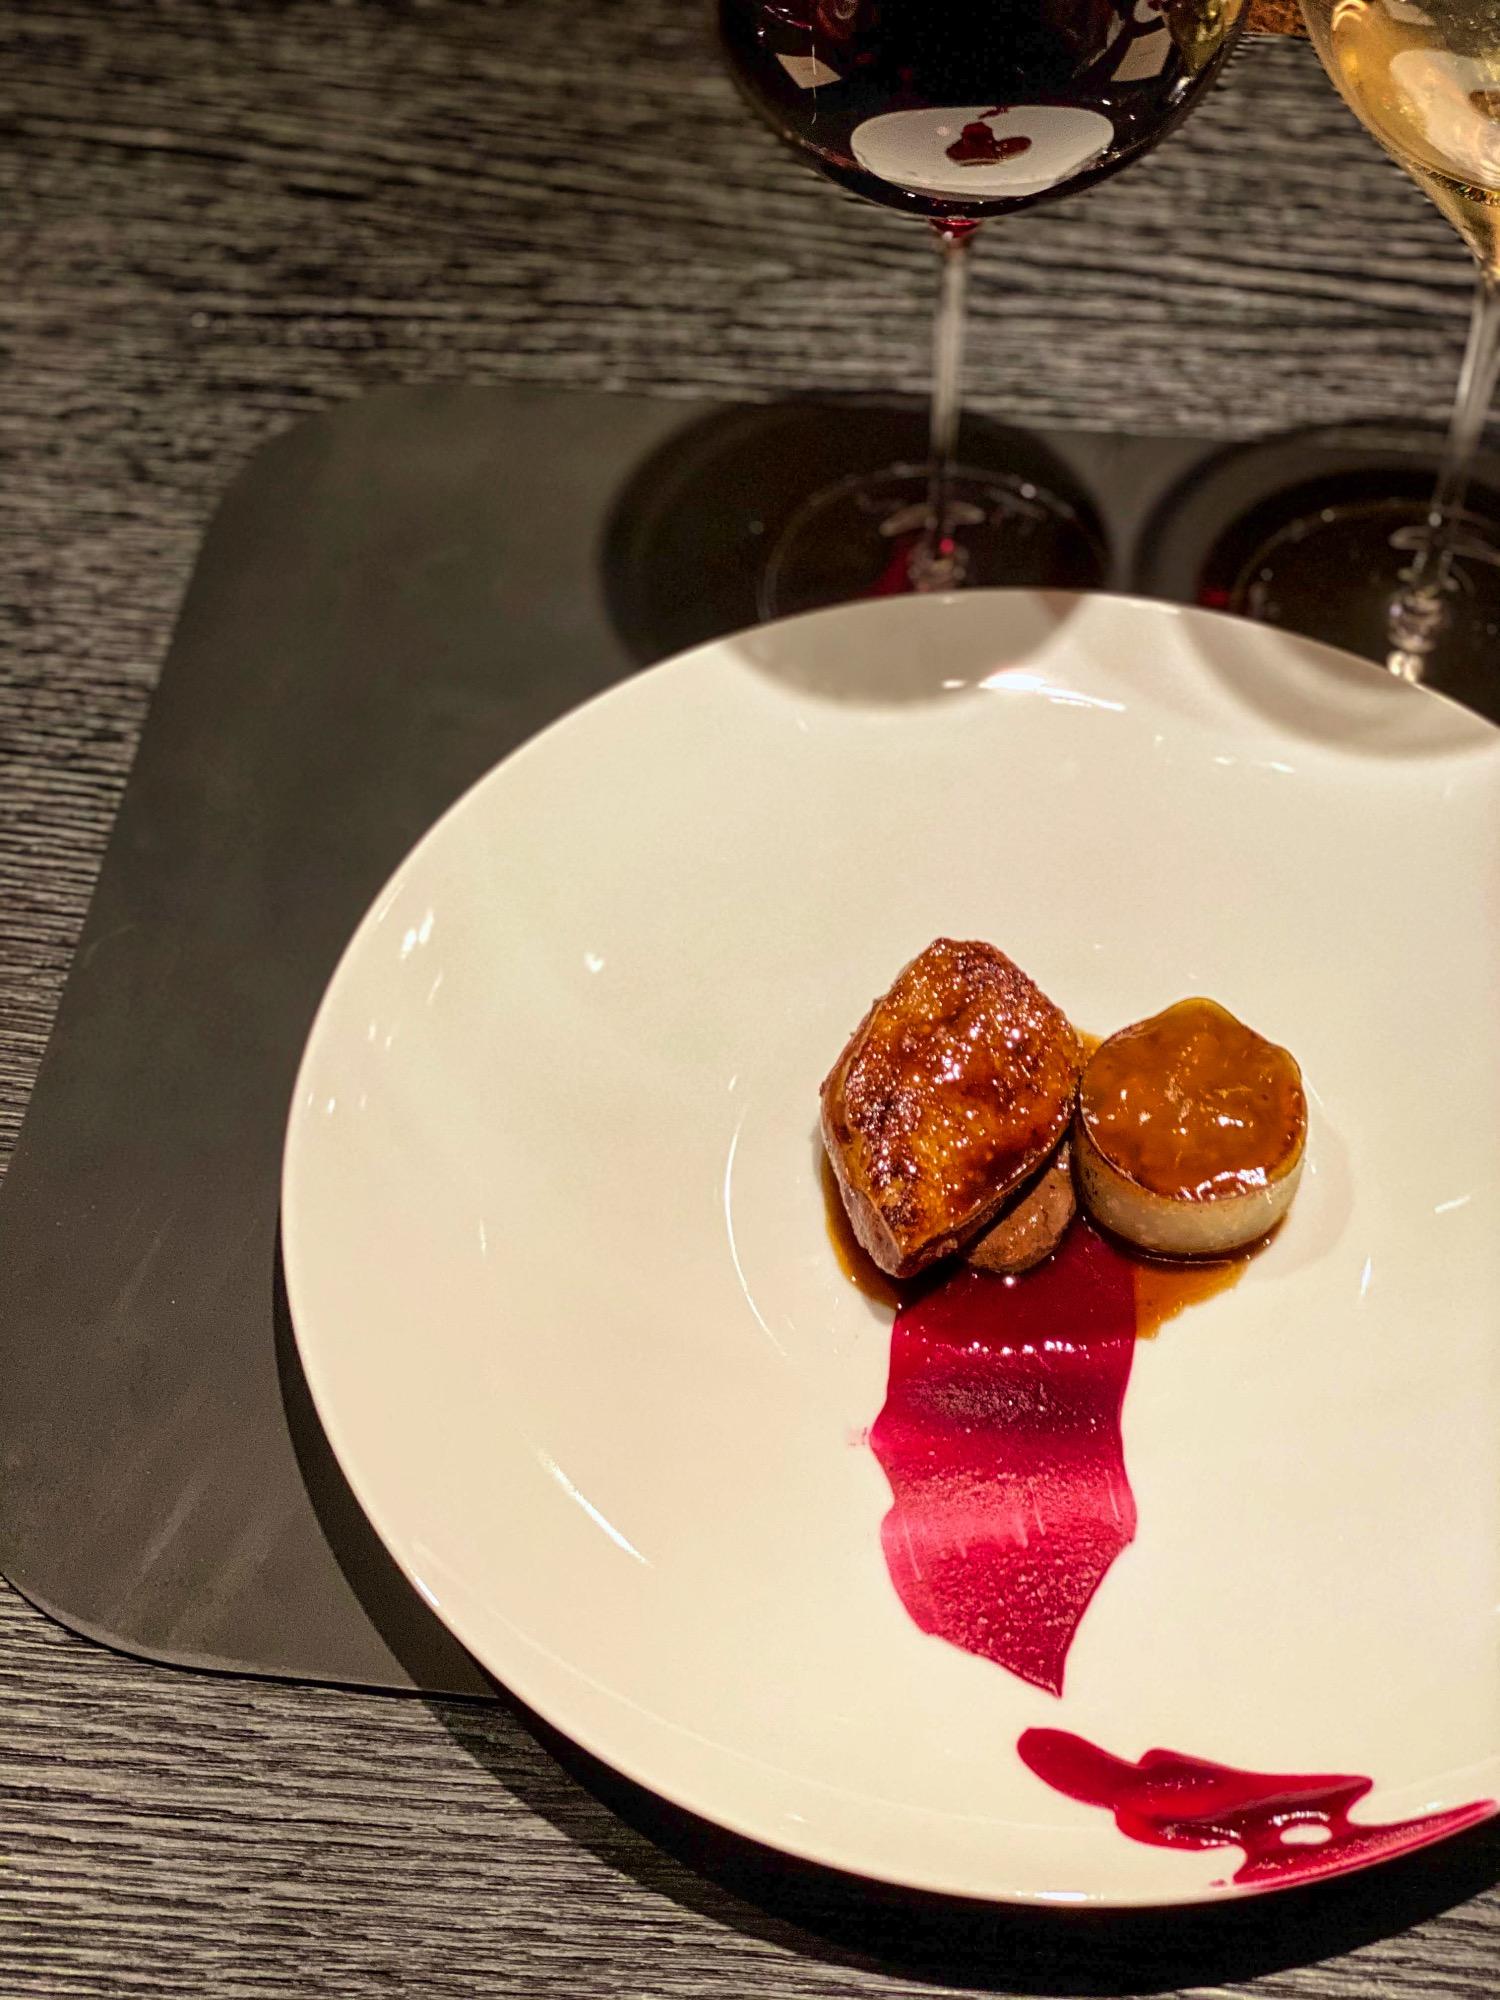 img_8643_rumour_racz_jeno_budapest_restaurant_jokuti_vilagevo_l_f.jpeg